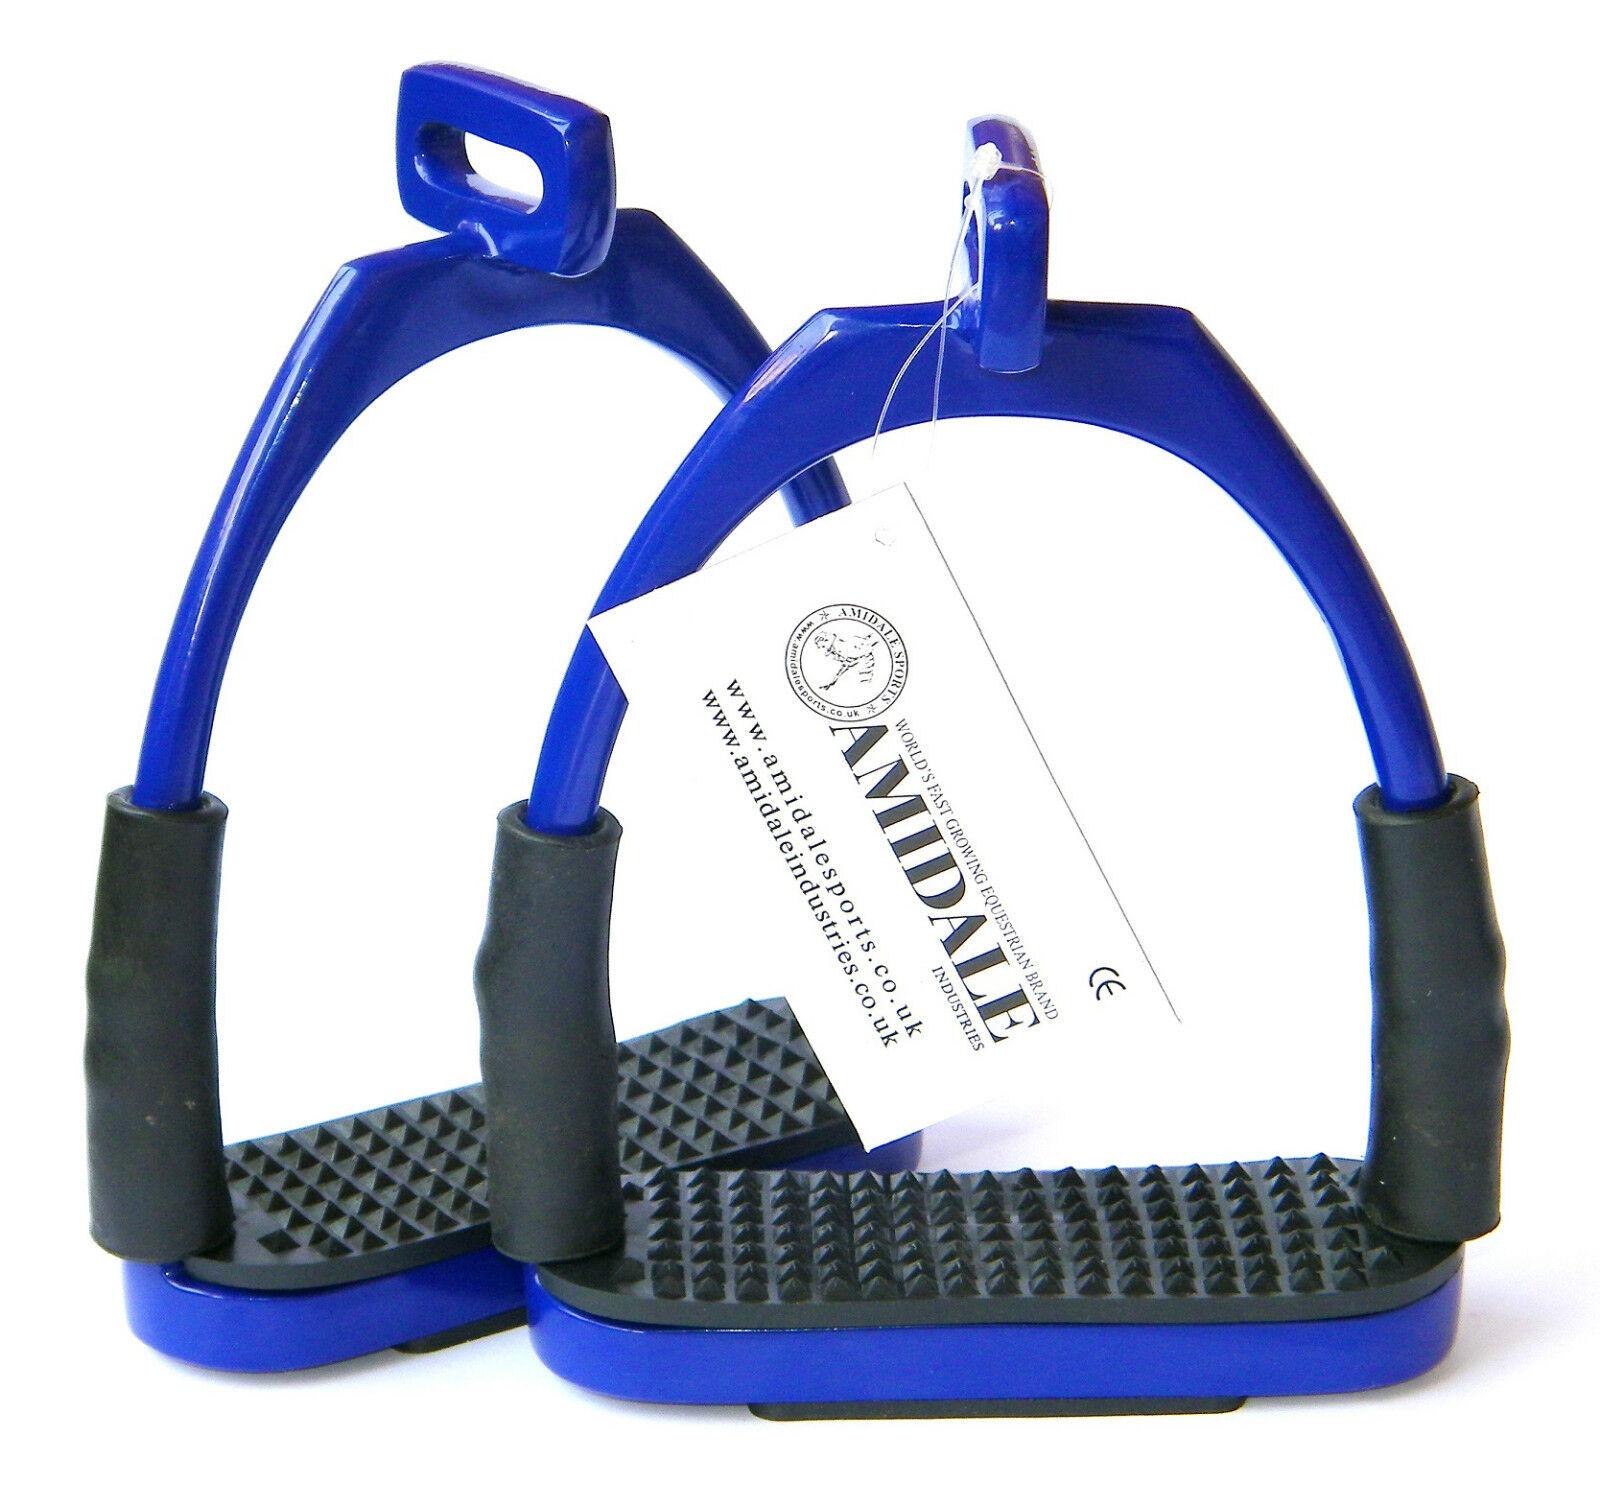 OFFSET EYE FLEXI SAFETY STIRRUPS FOR OPTIMUM LEG POSITION HORSE RIDING IN N.BLU